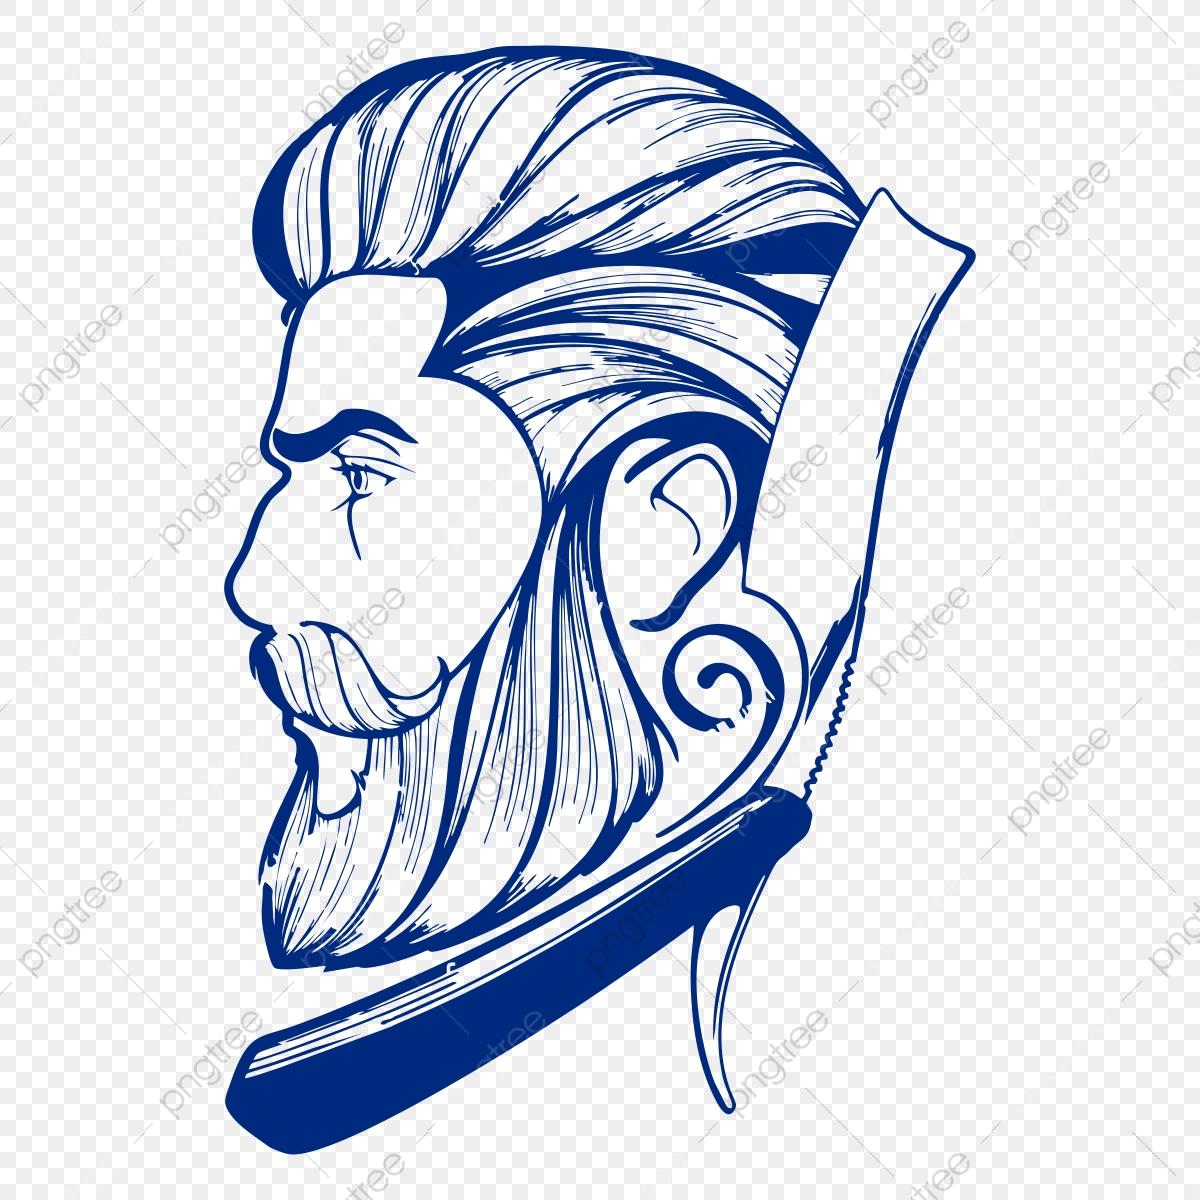 clipart black and white stock Barber shop . Haircut clipart cartoon